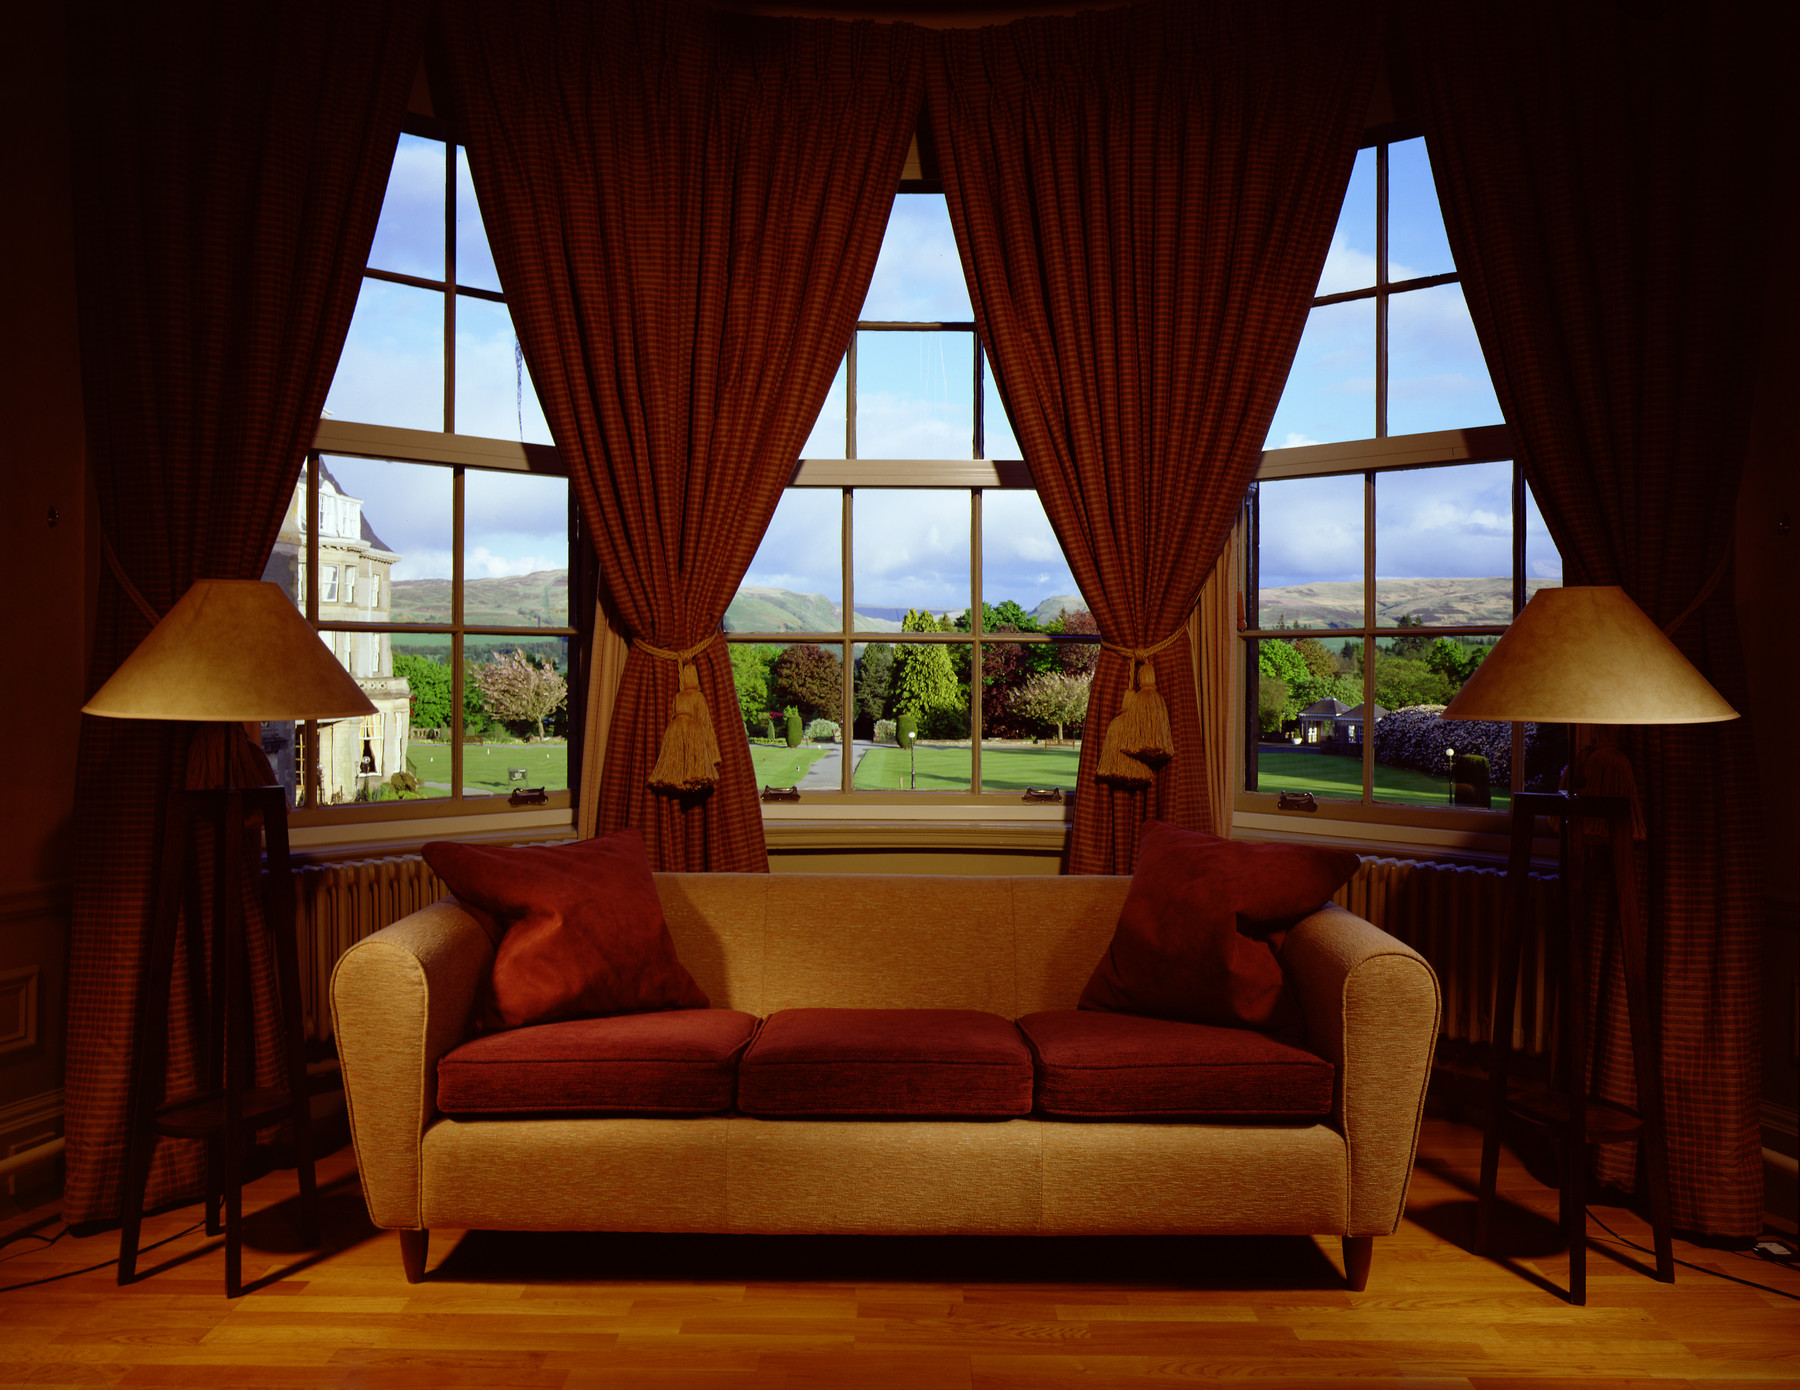 glen hotel.jpg